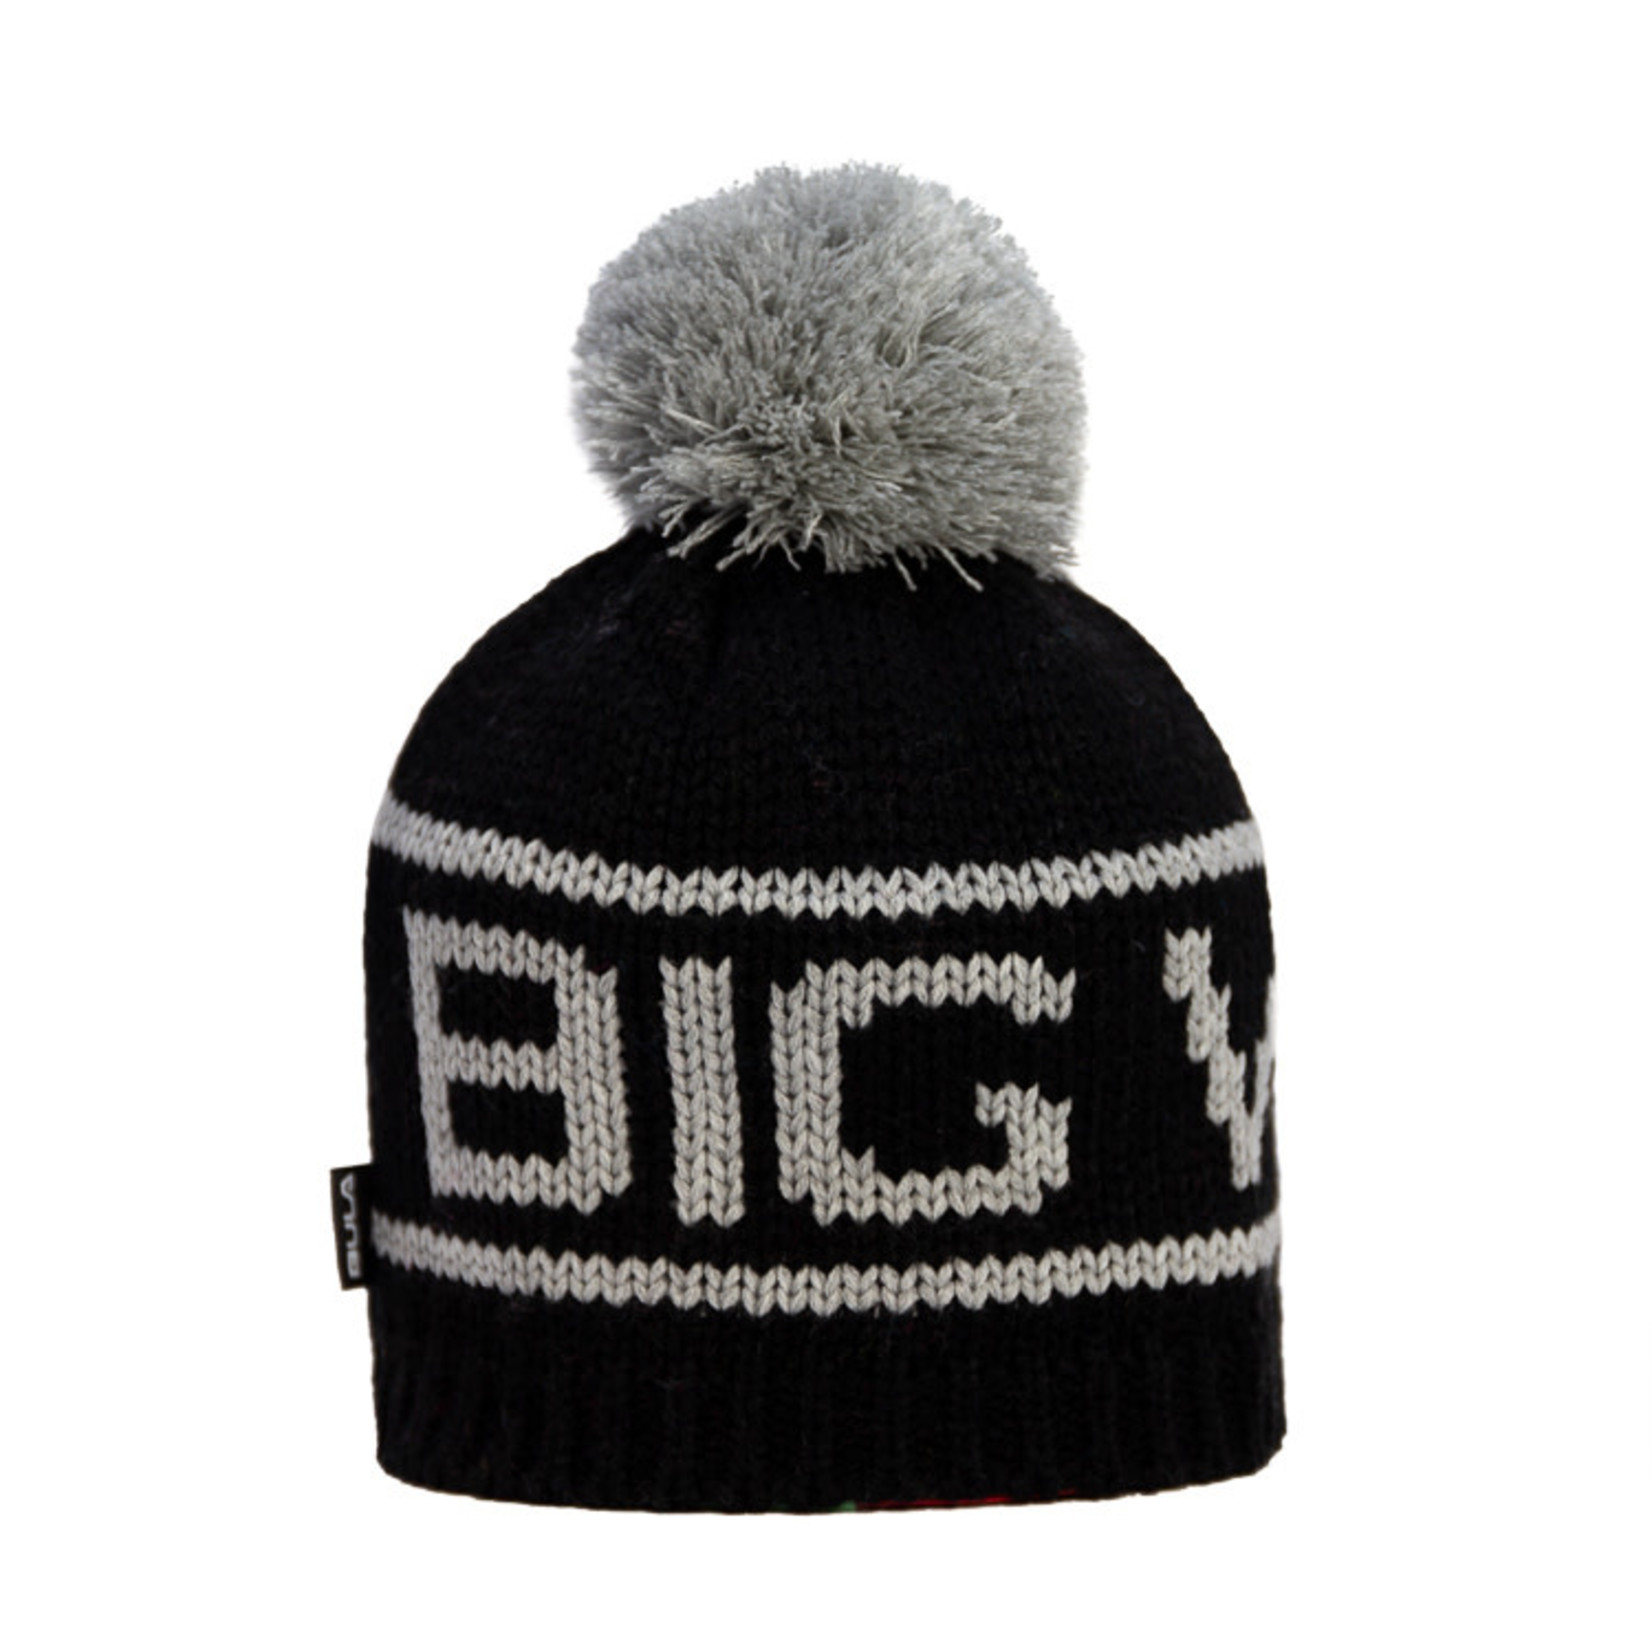 Big White Big Pom Black/Grey